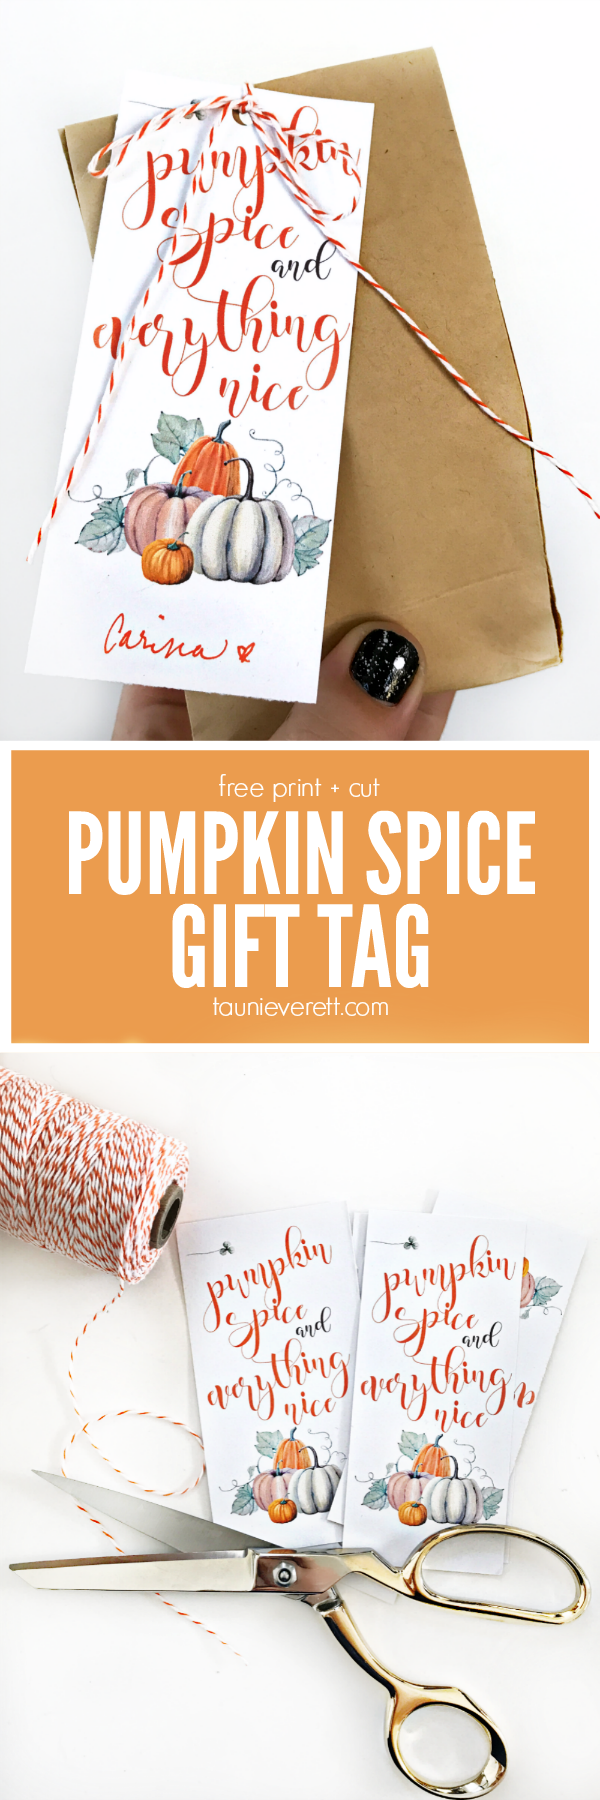 Free print and cut pumpkin spice gift tag #pumpkin #pumpkinspice #printable